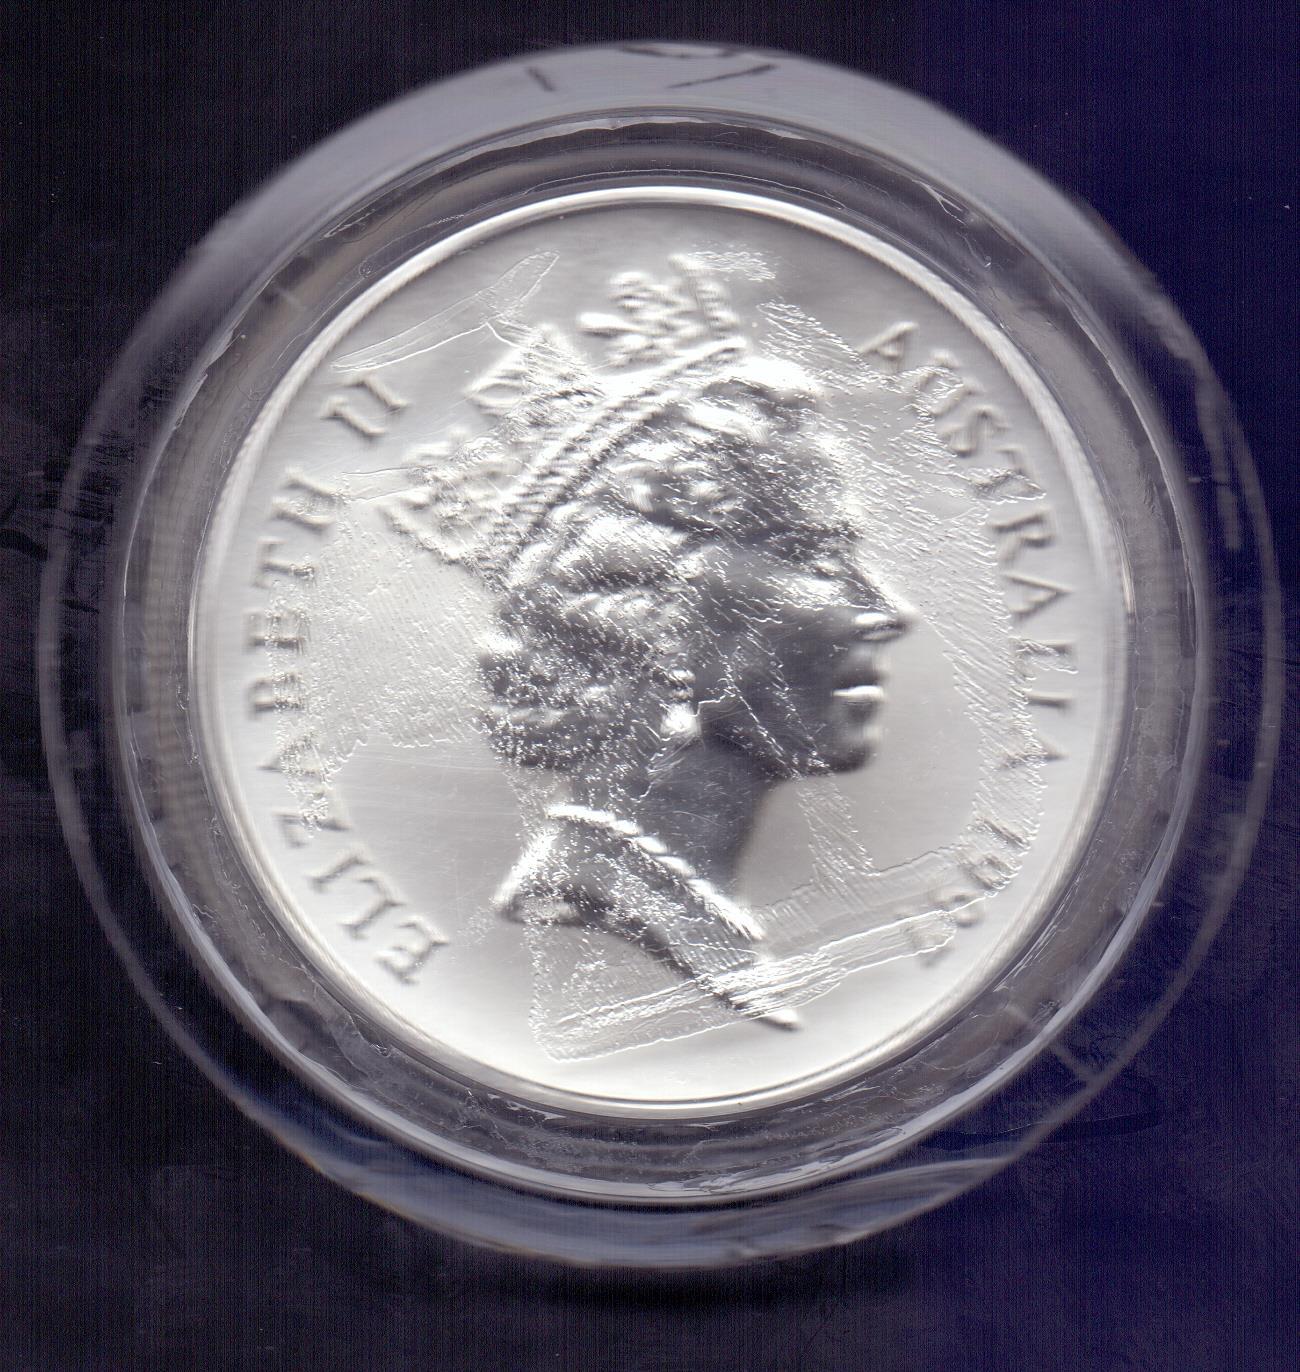 Lot 137 - COINS : Australia 1997 1oz Silver Kangar